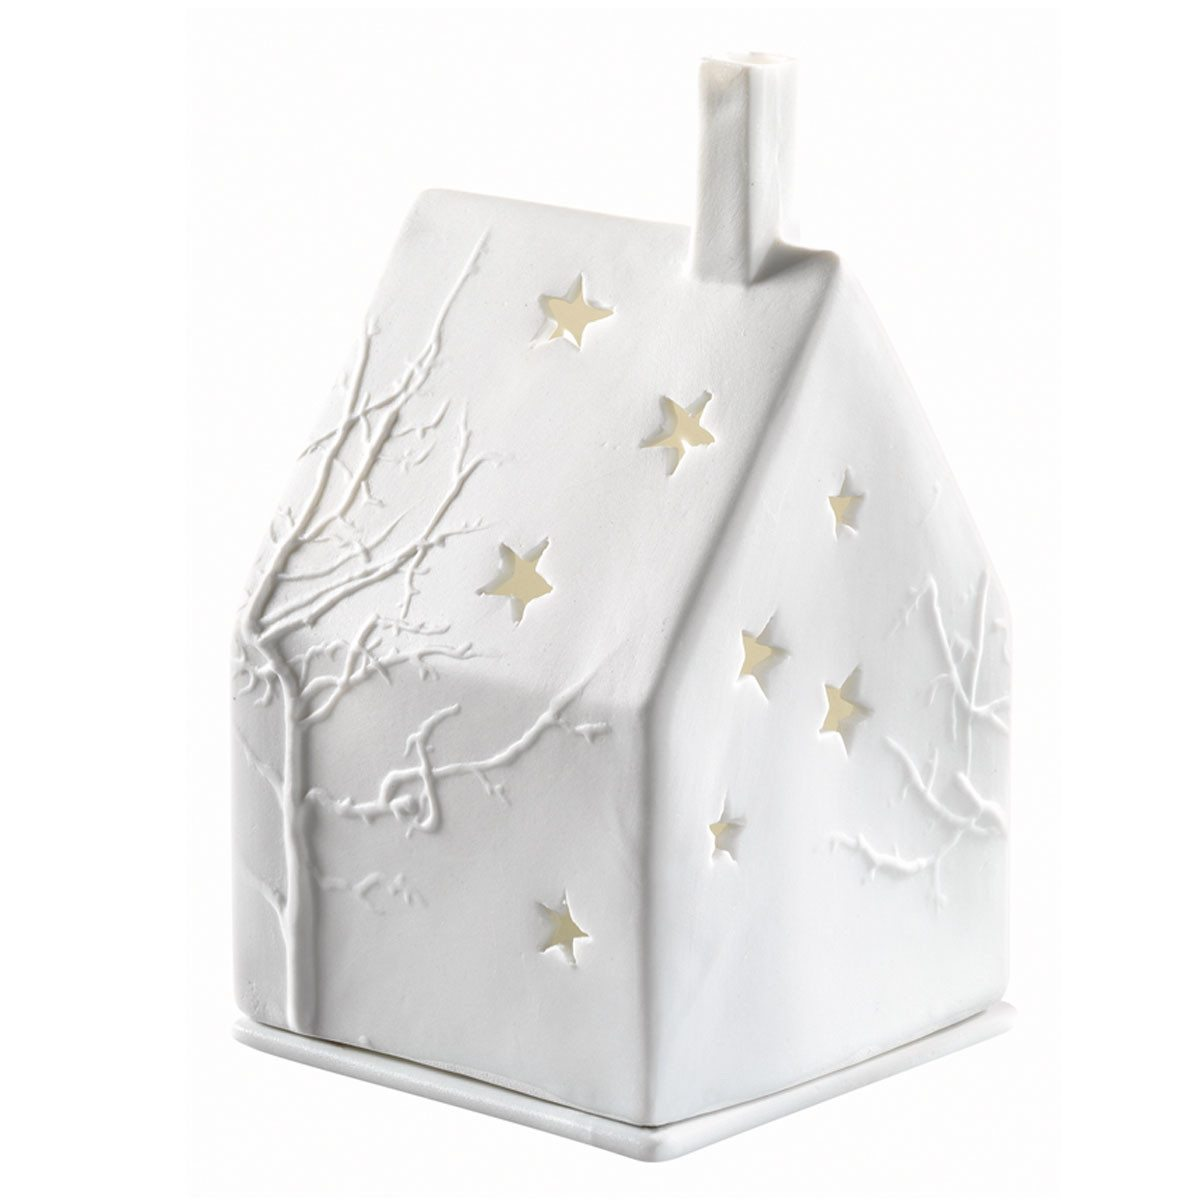 Casa de luces invernal  - Detalle navideño